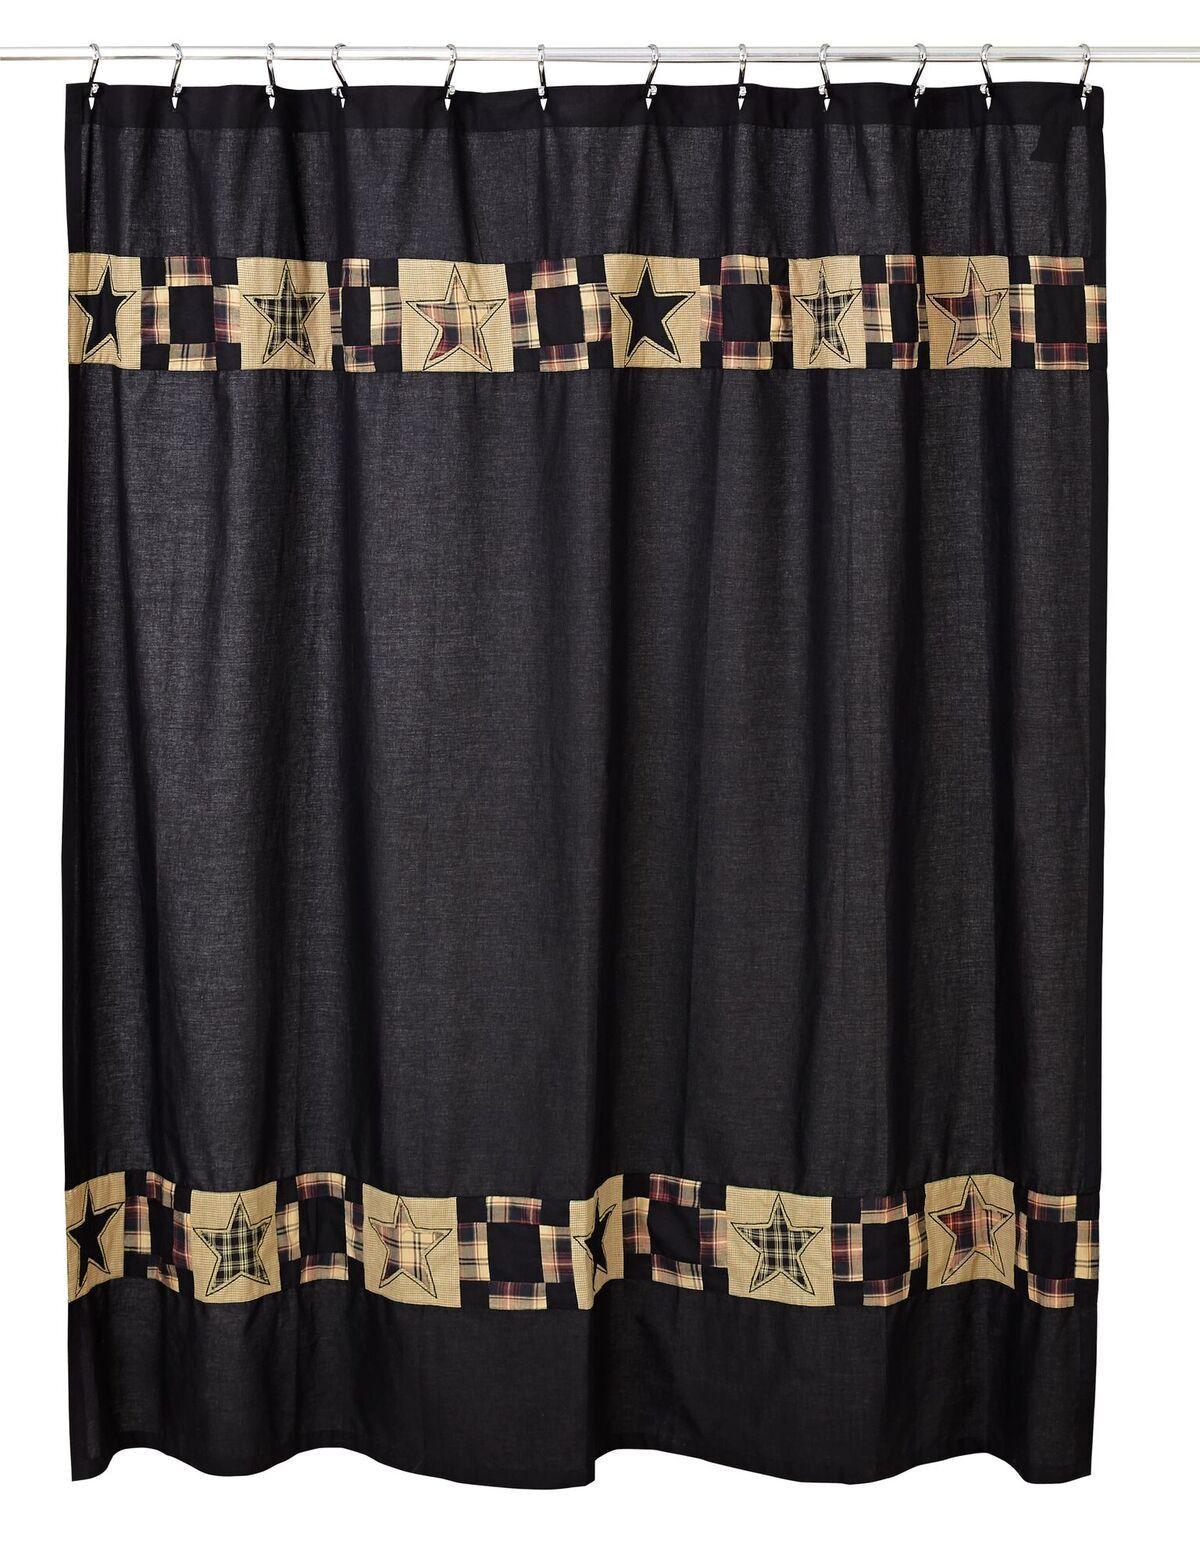 Revere Shower Curtain Primitive Bathrooms Primitive Bathroom